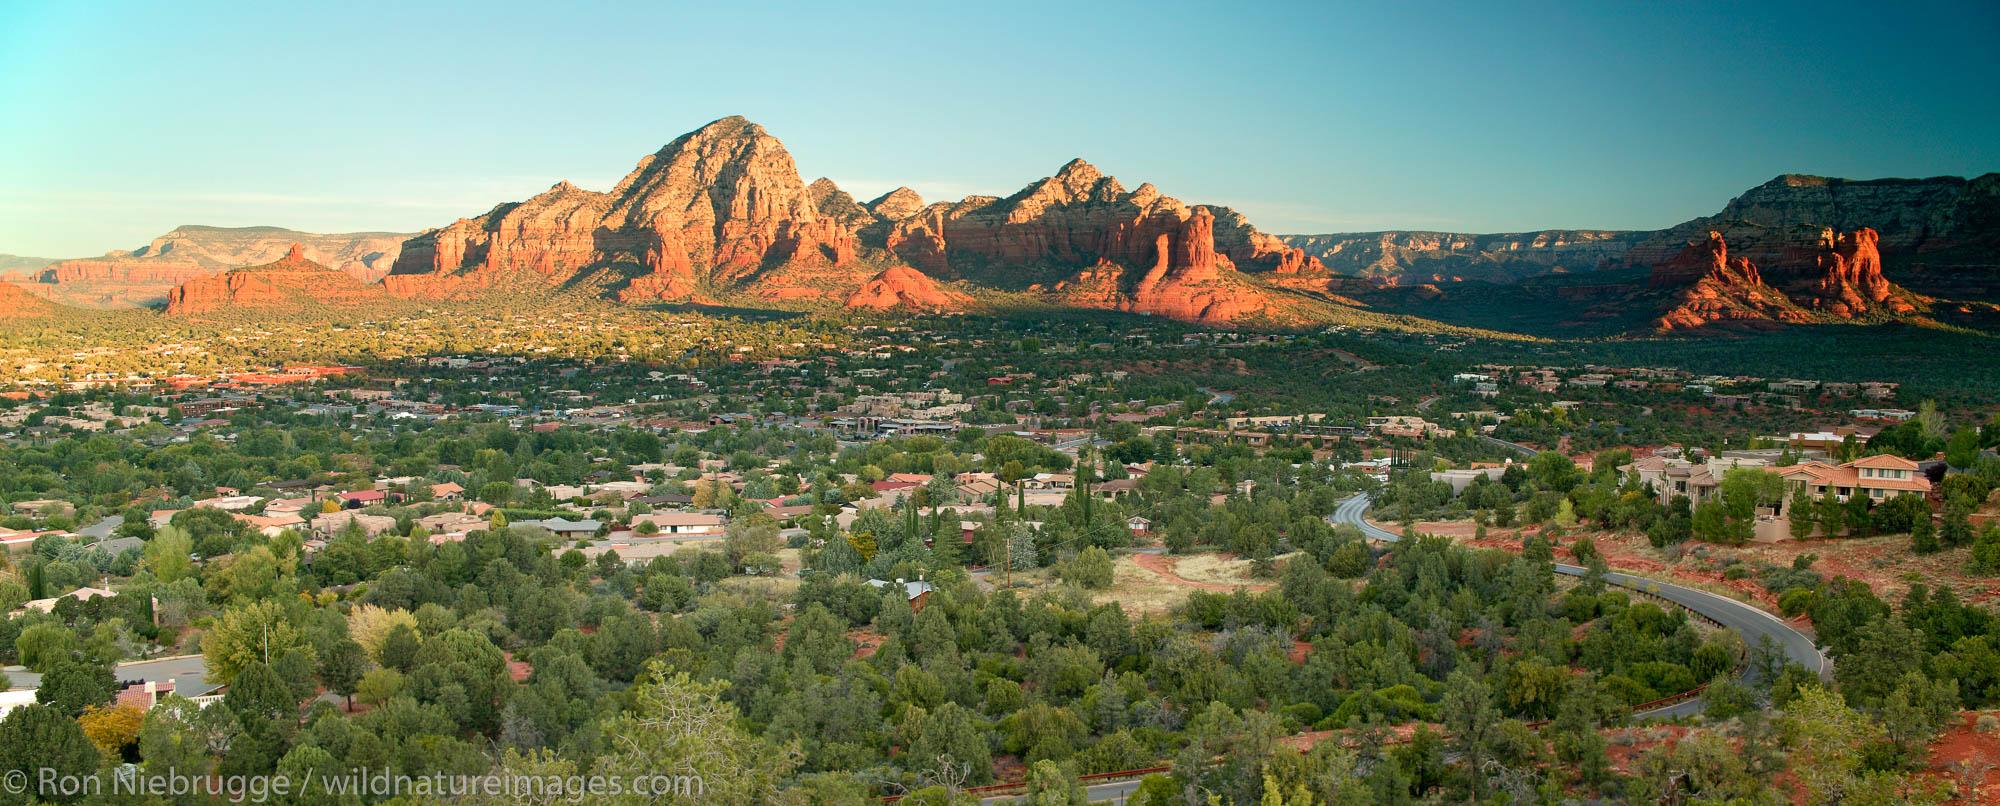 The town of Sedona, Arizona.